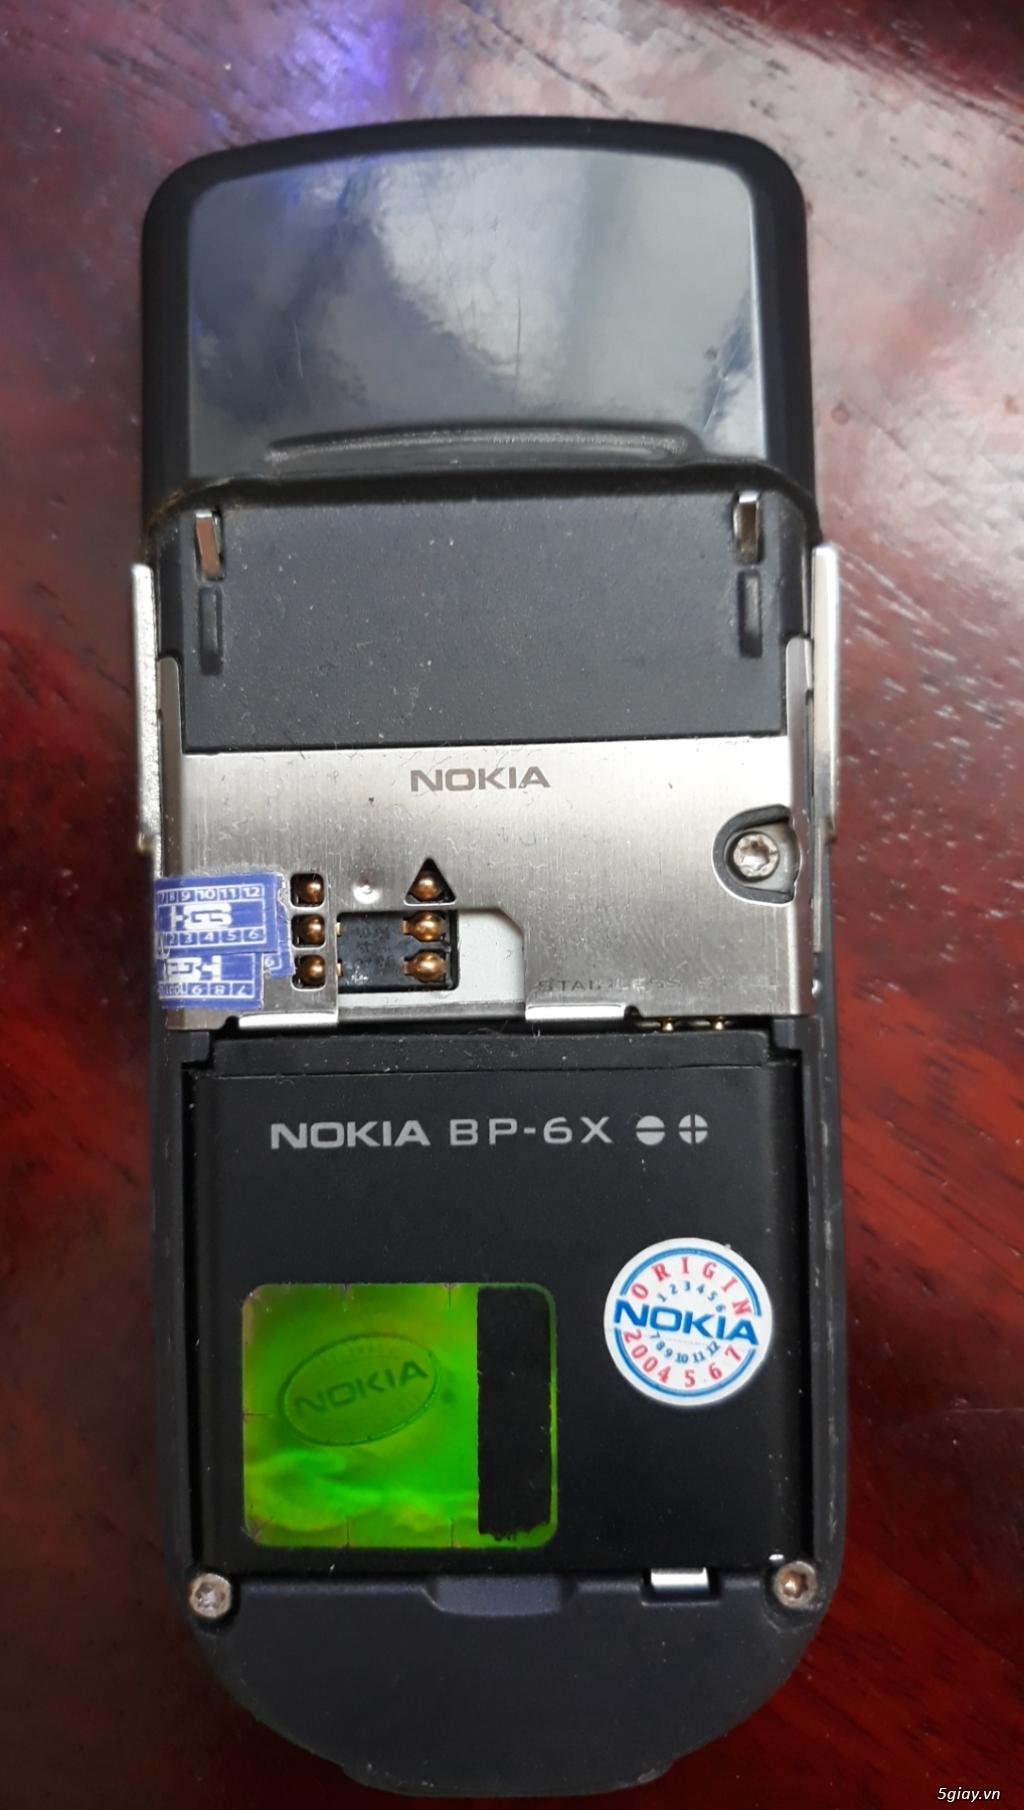 Nokia 8800 Vang danh một thời. - 1